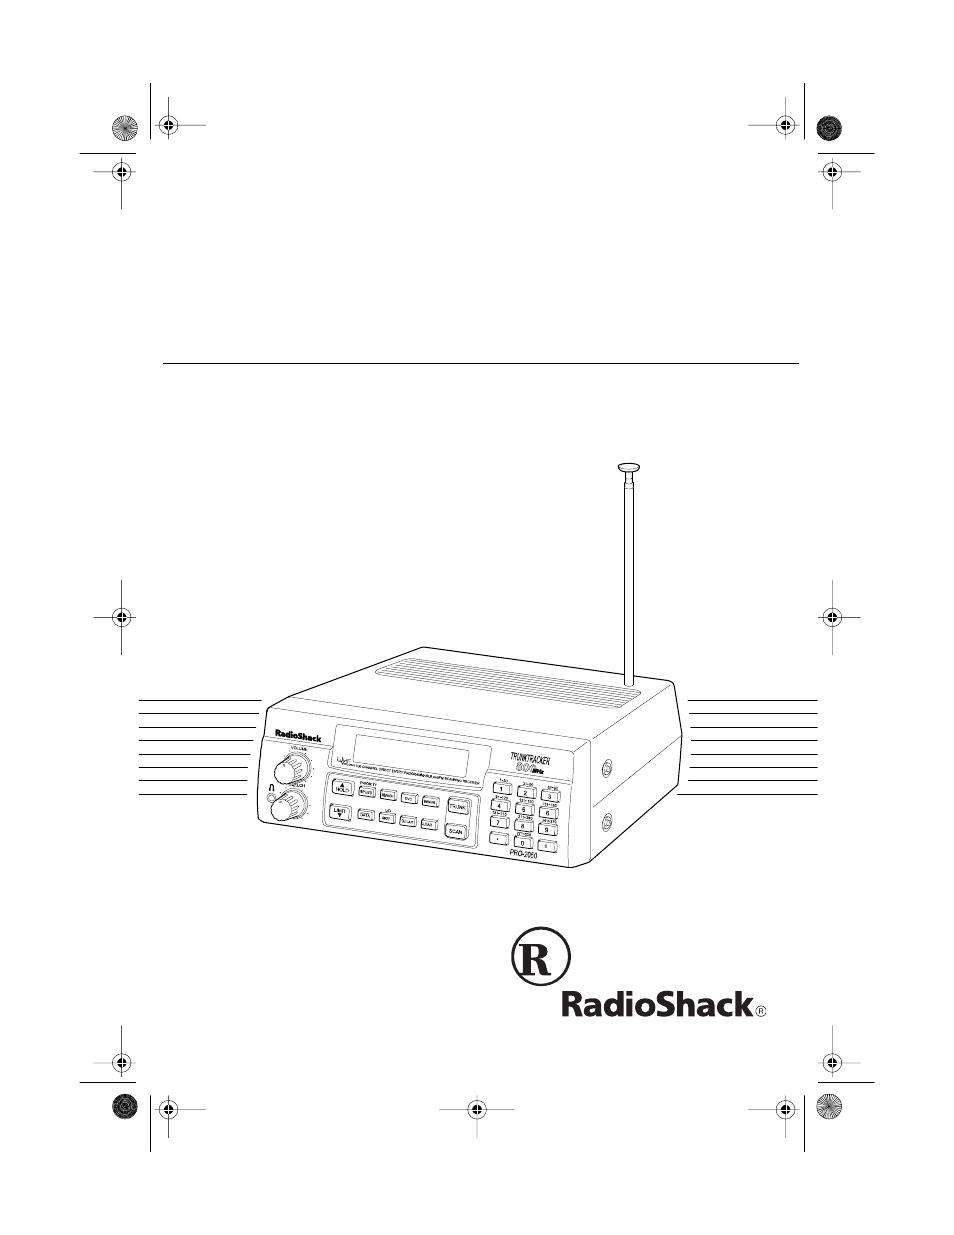 radio shack pro 2050 user manual 56 pages radio shack pro-38 manual realistic pro 38 scanner manual